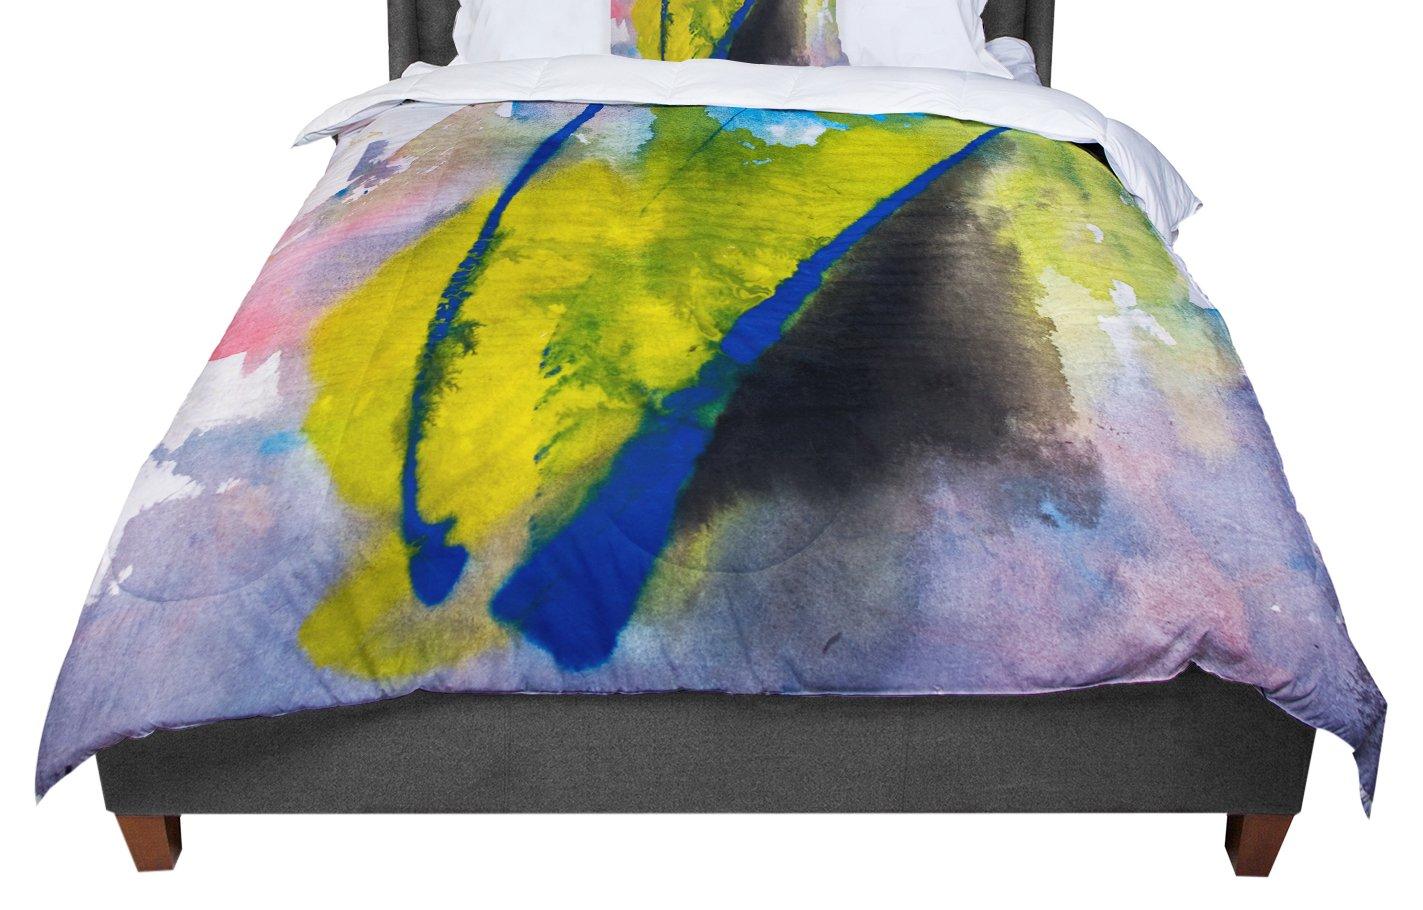 KESS InHouse Malia Shields 'Exploration' Yellow Blue Twin Comforter, 68' X 88'